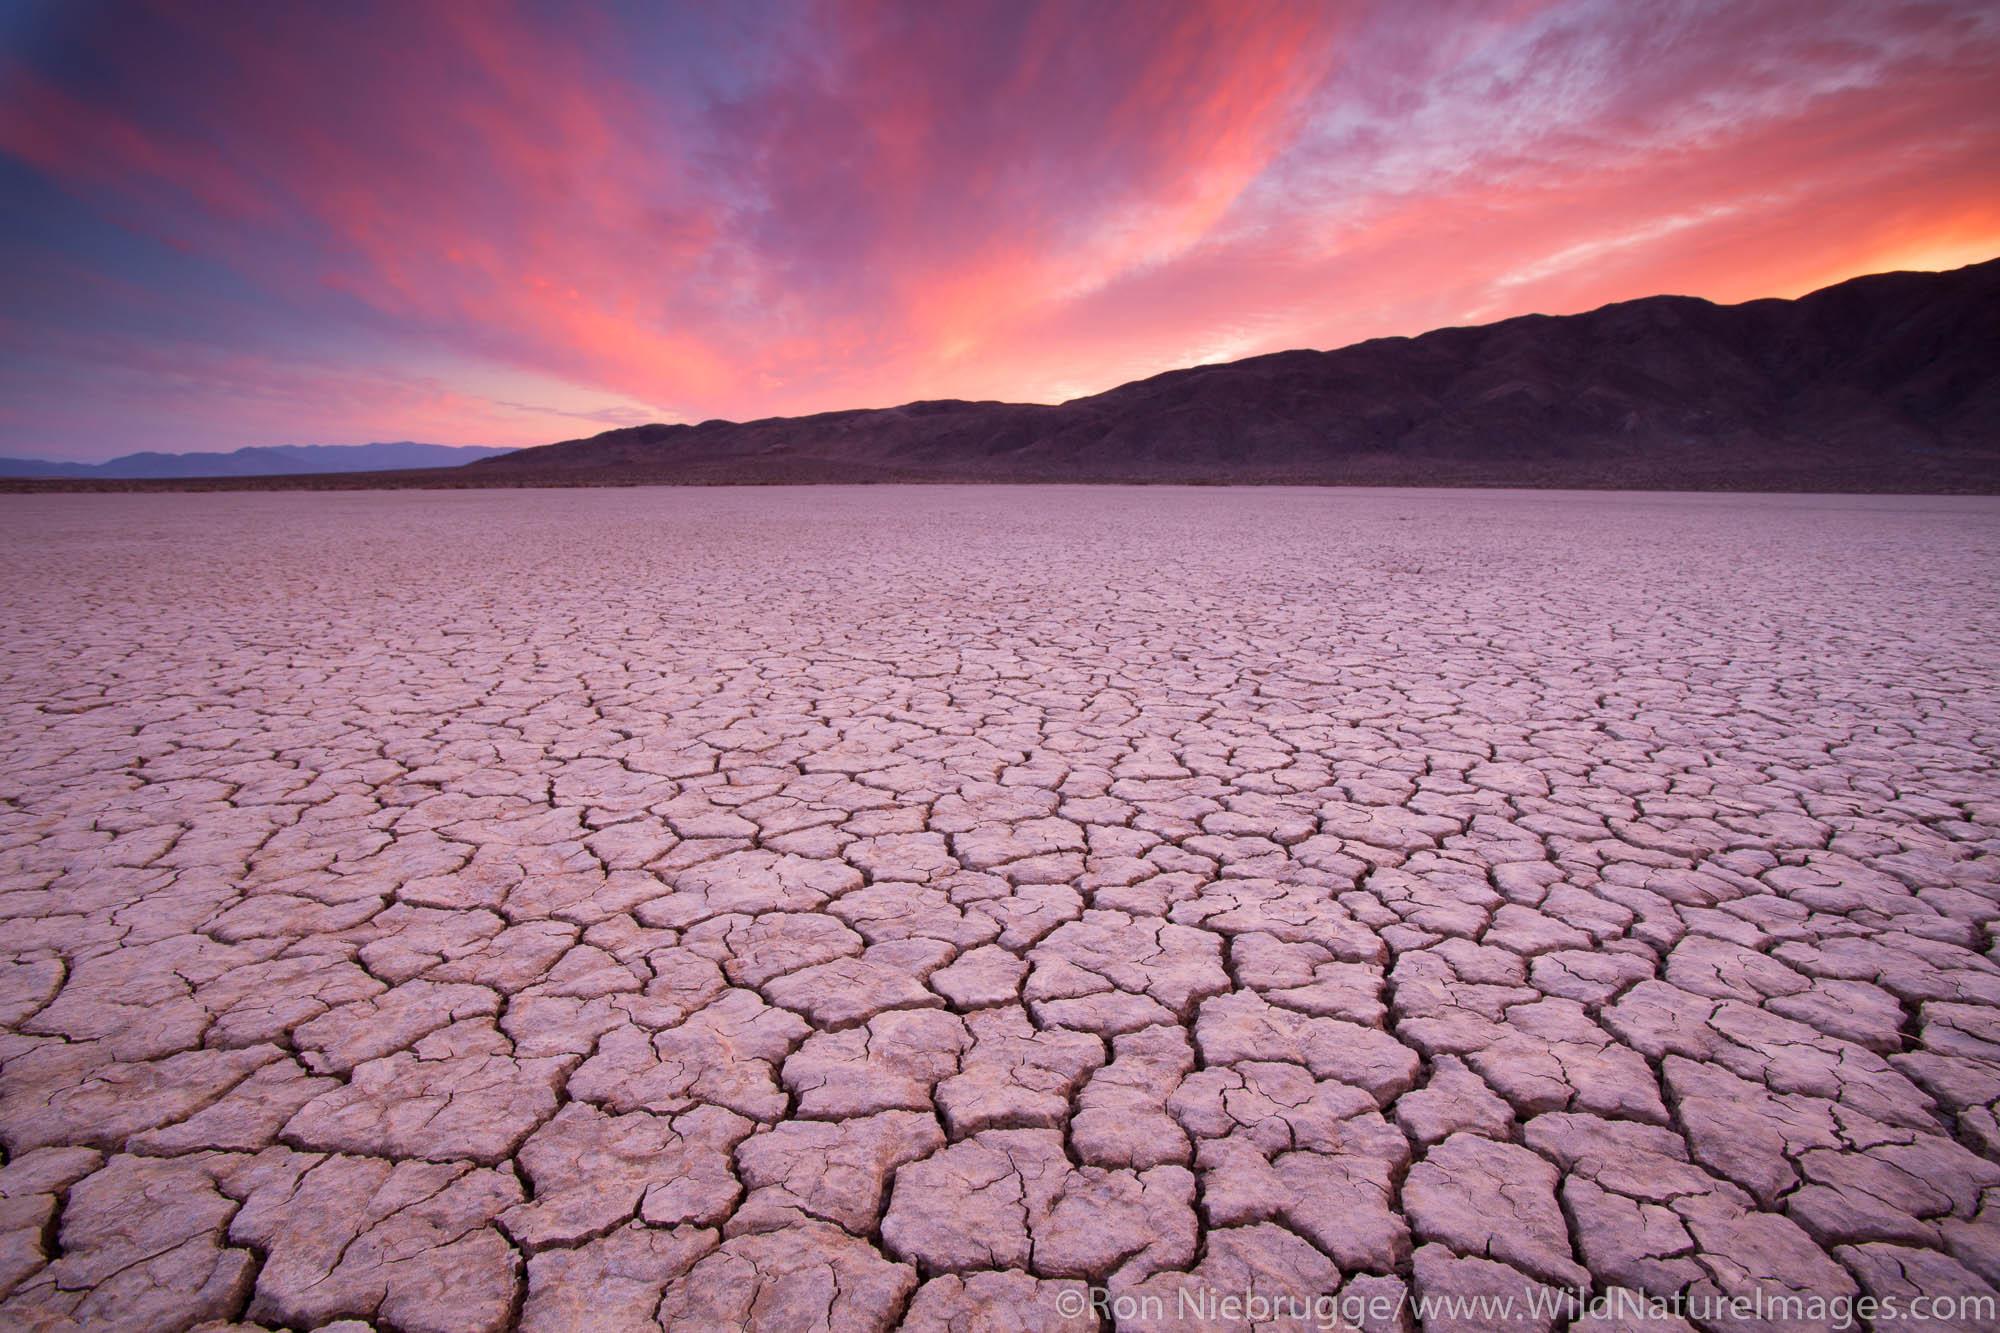 Dry lake bed, Anza-Borrego Desert State Park, California.